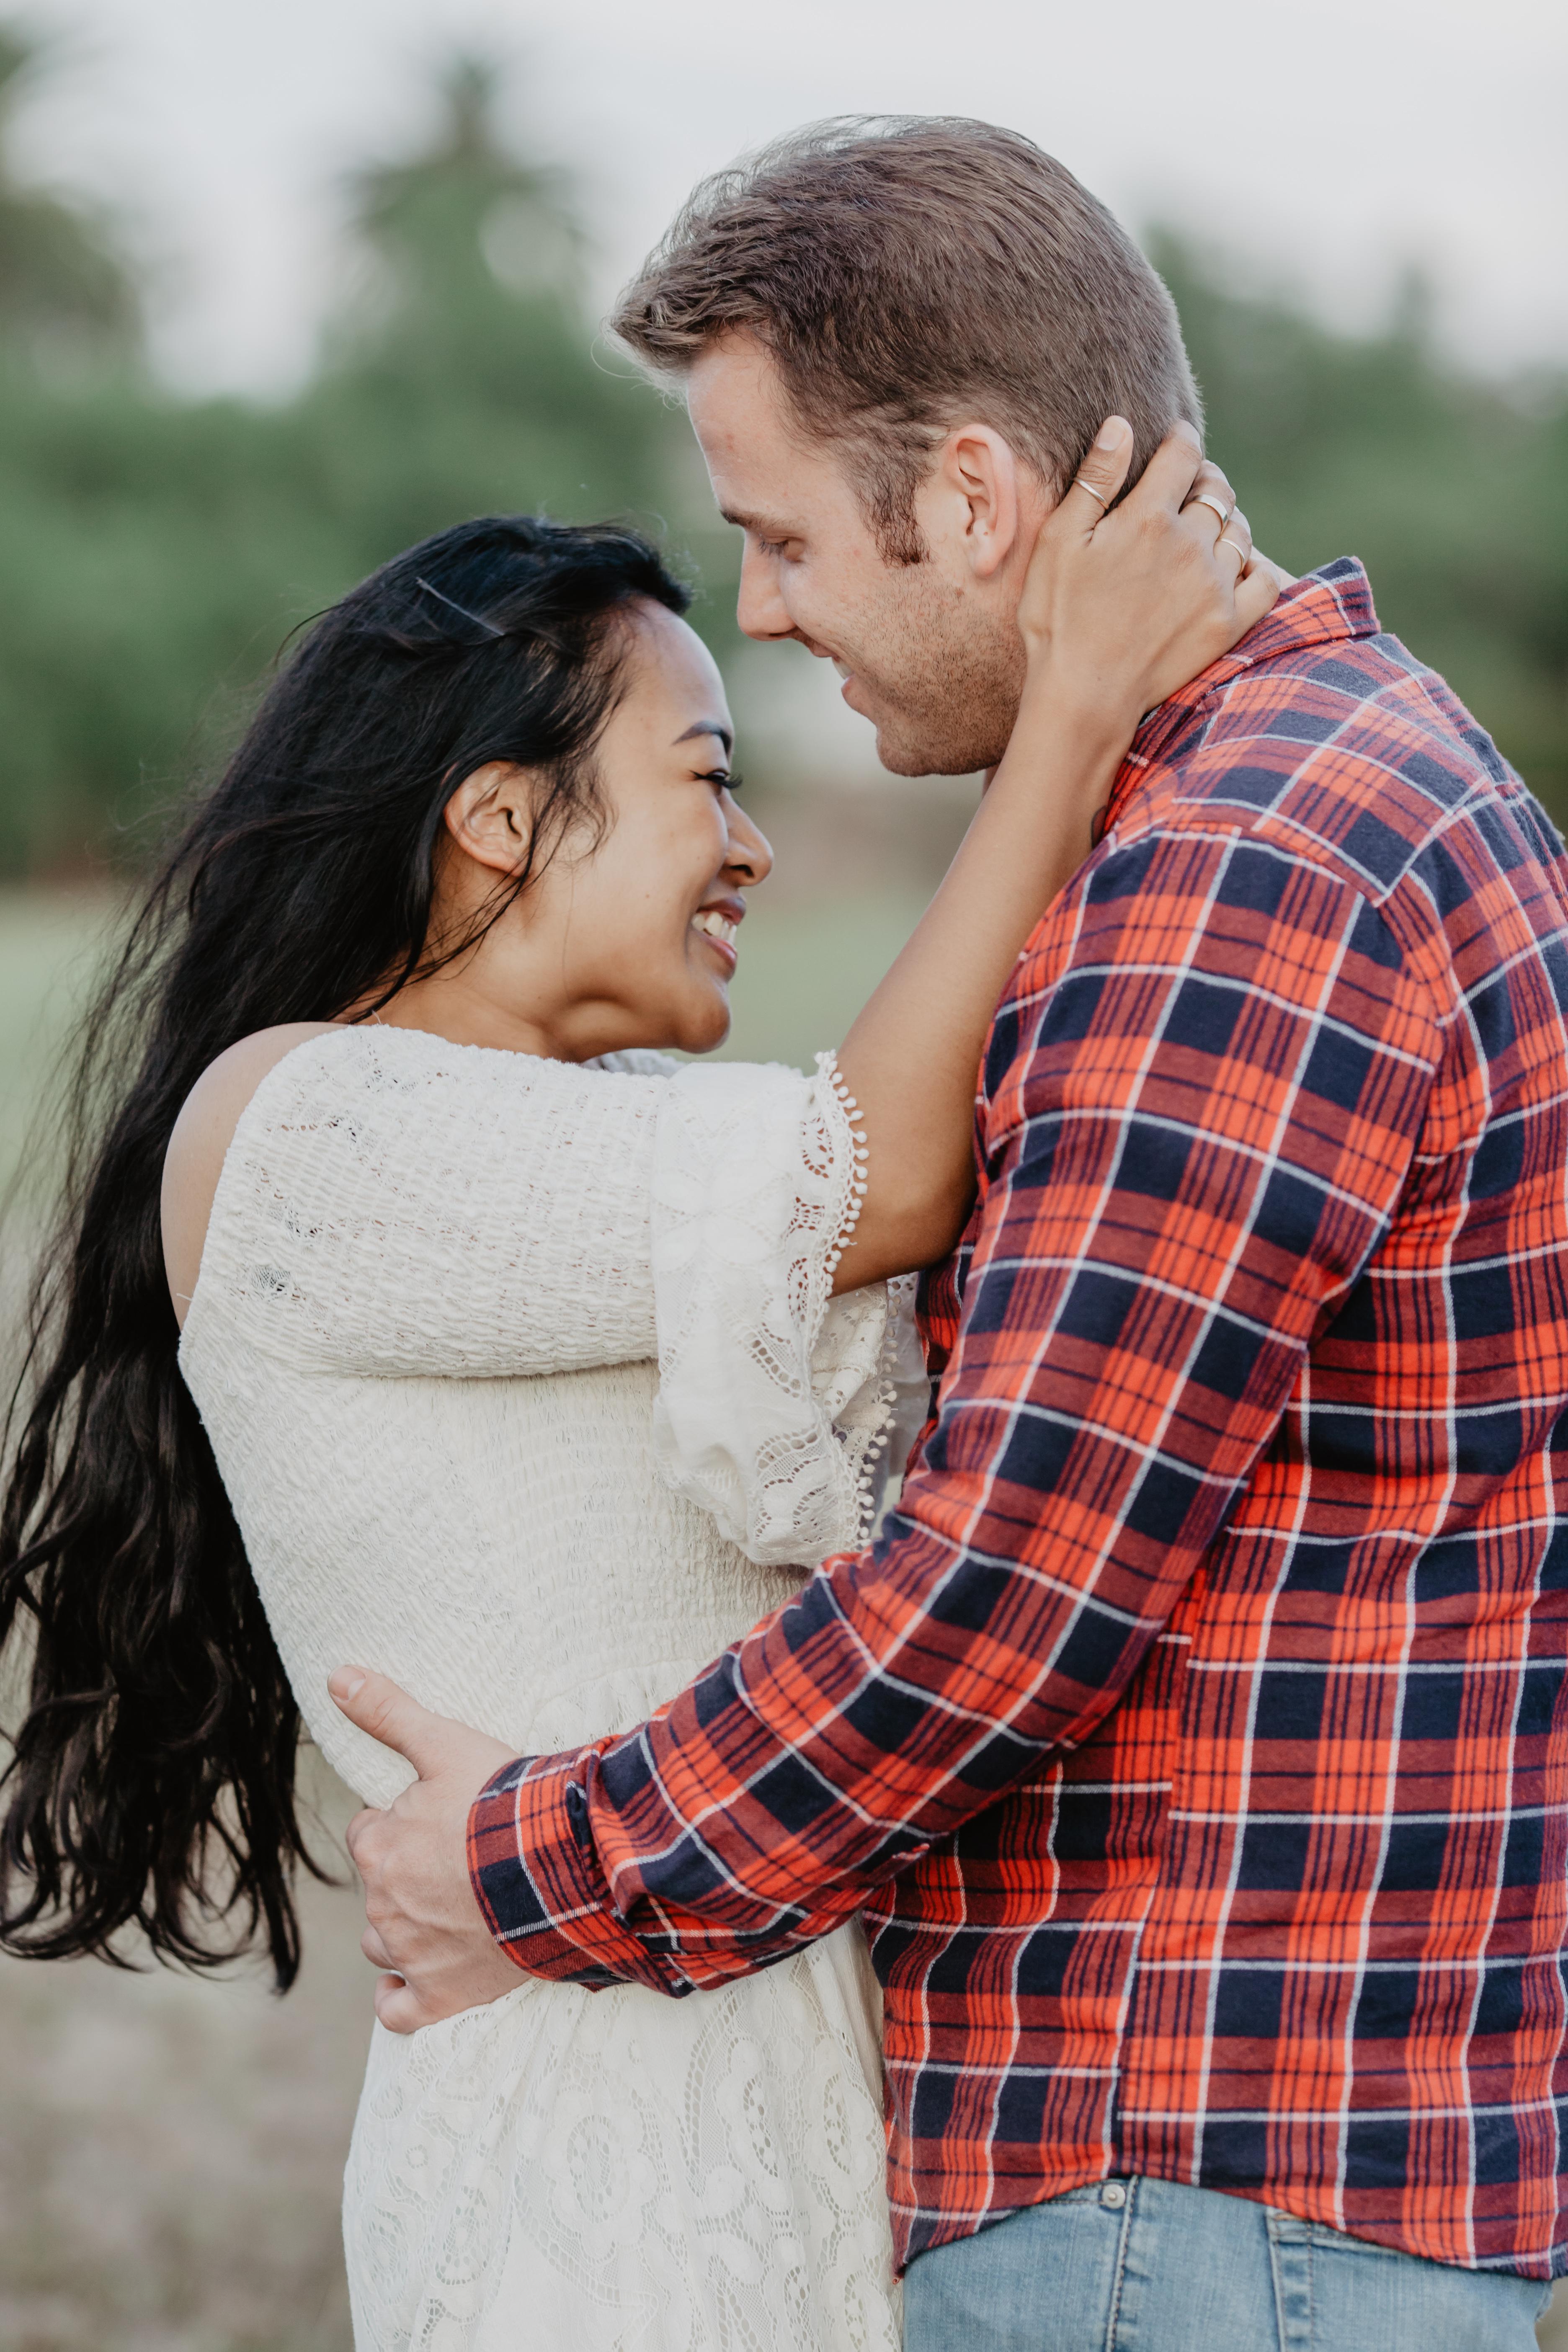 IMG 4410 - Lei and Matthew | Engaged | San Diego wedding photographer